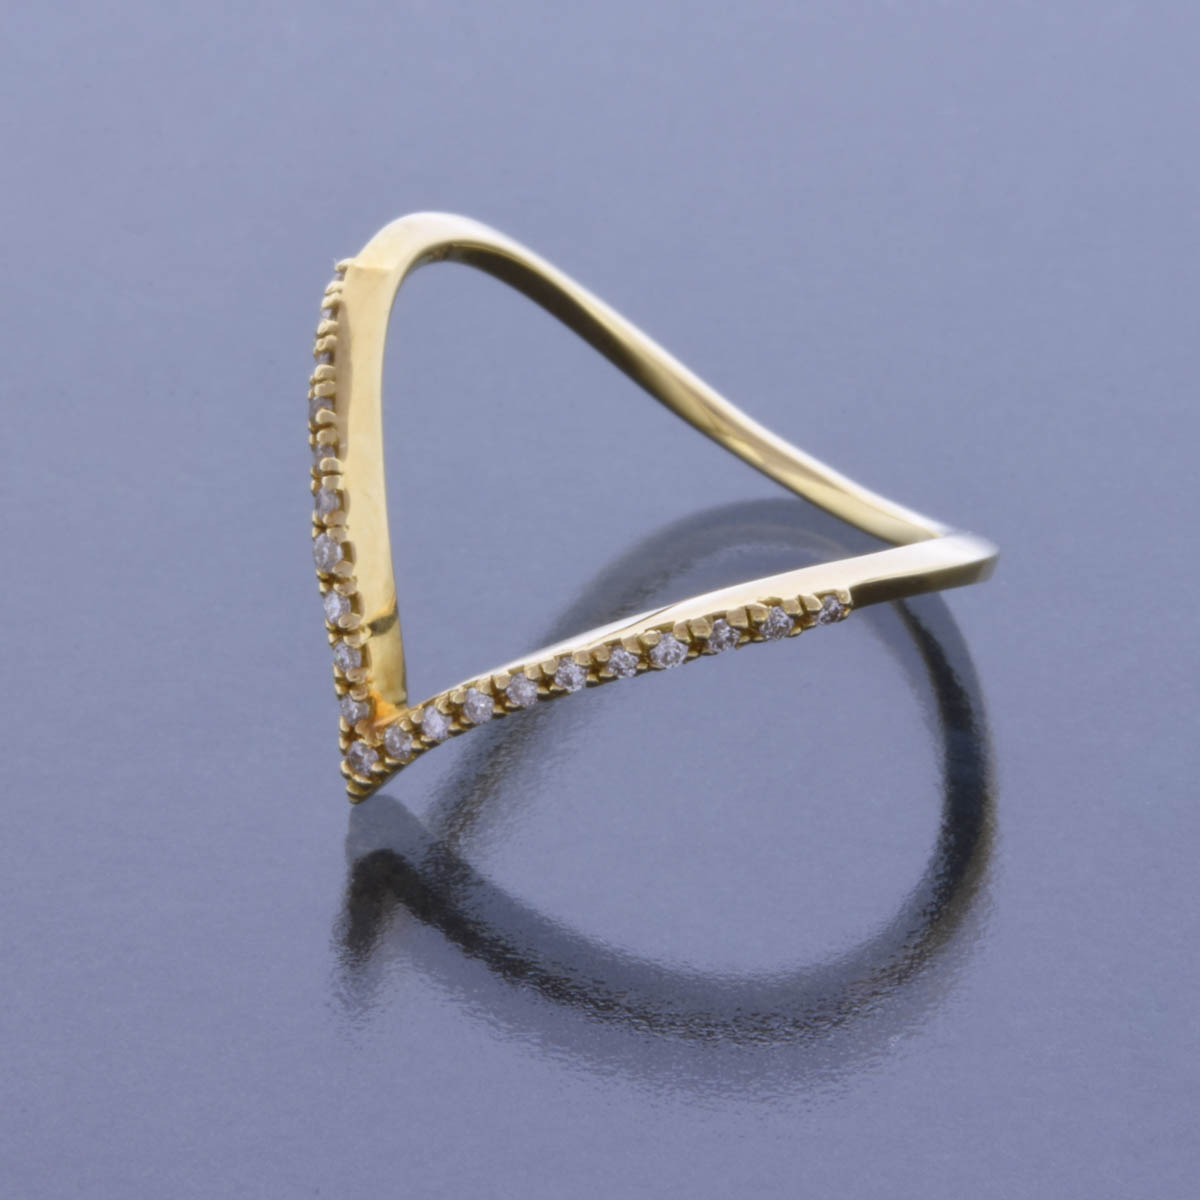 K18YG ダイヤモンド リング  Vラインモチーフ